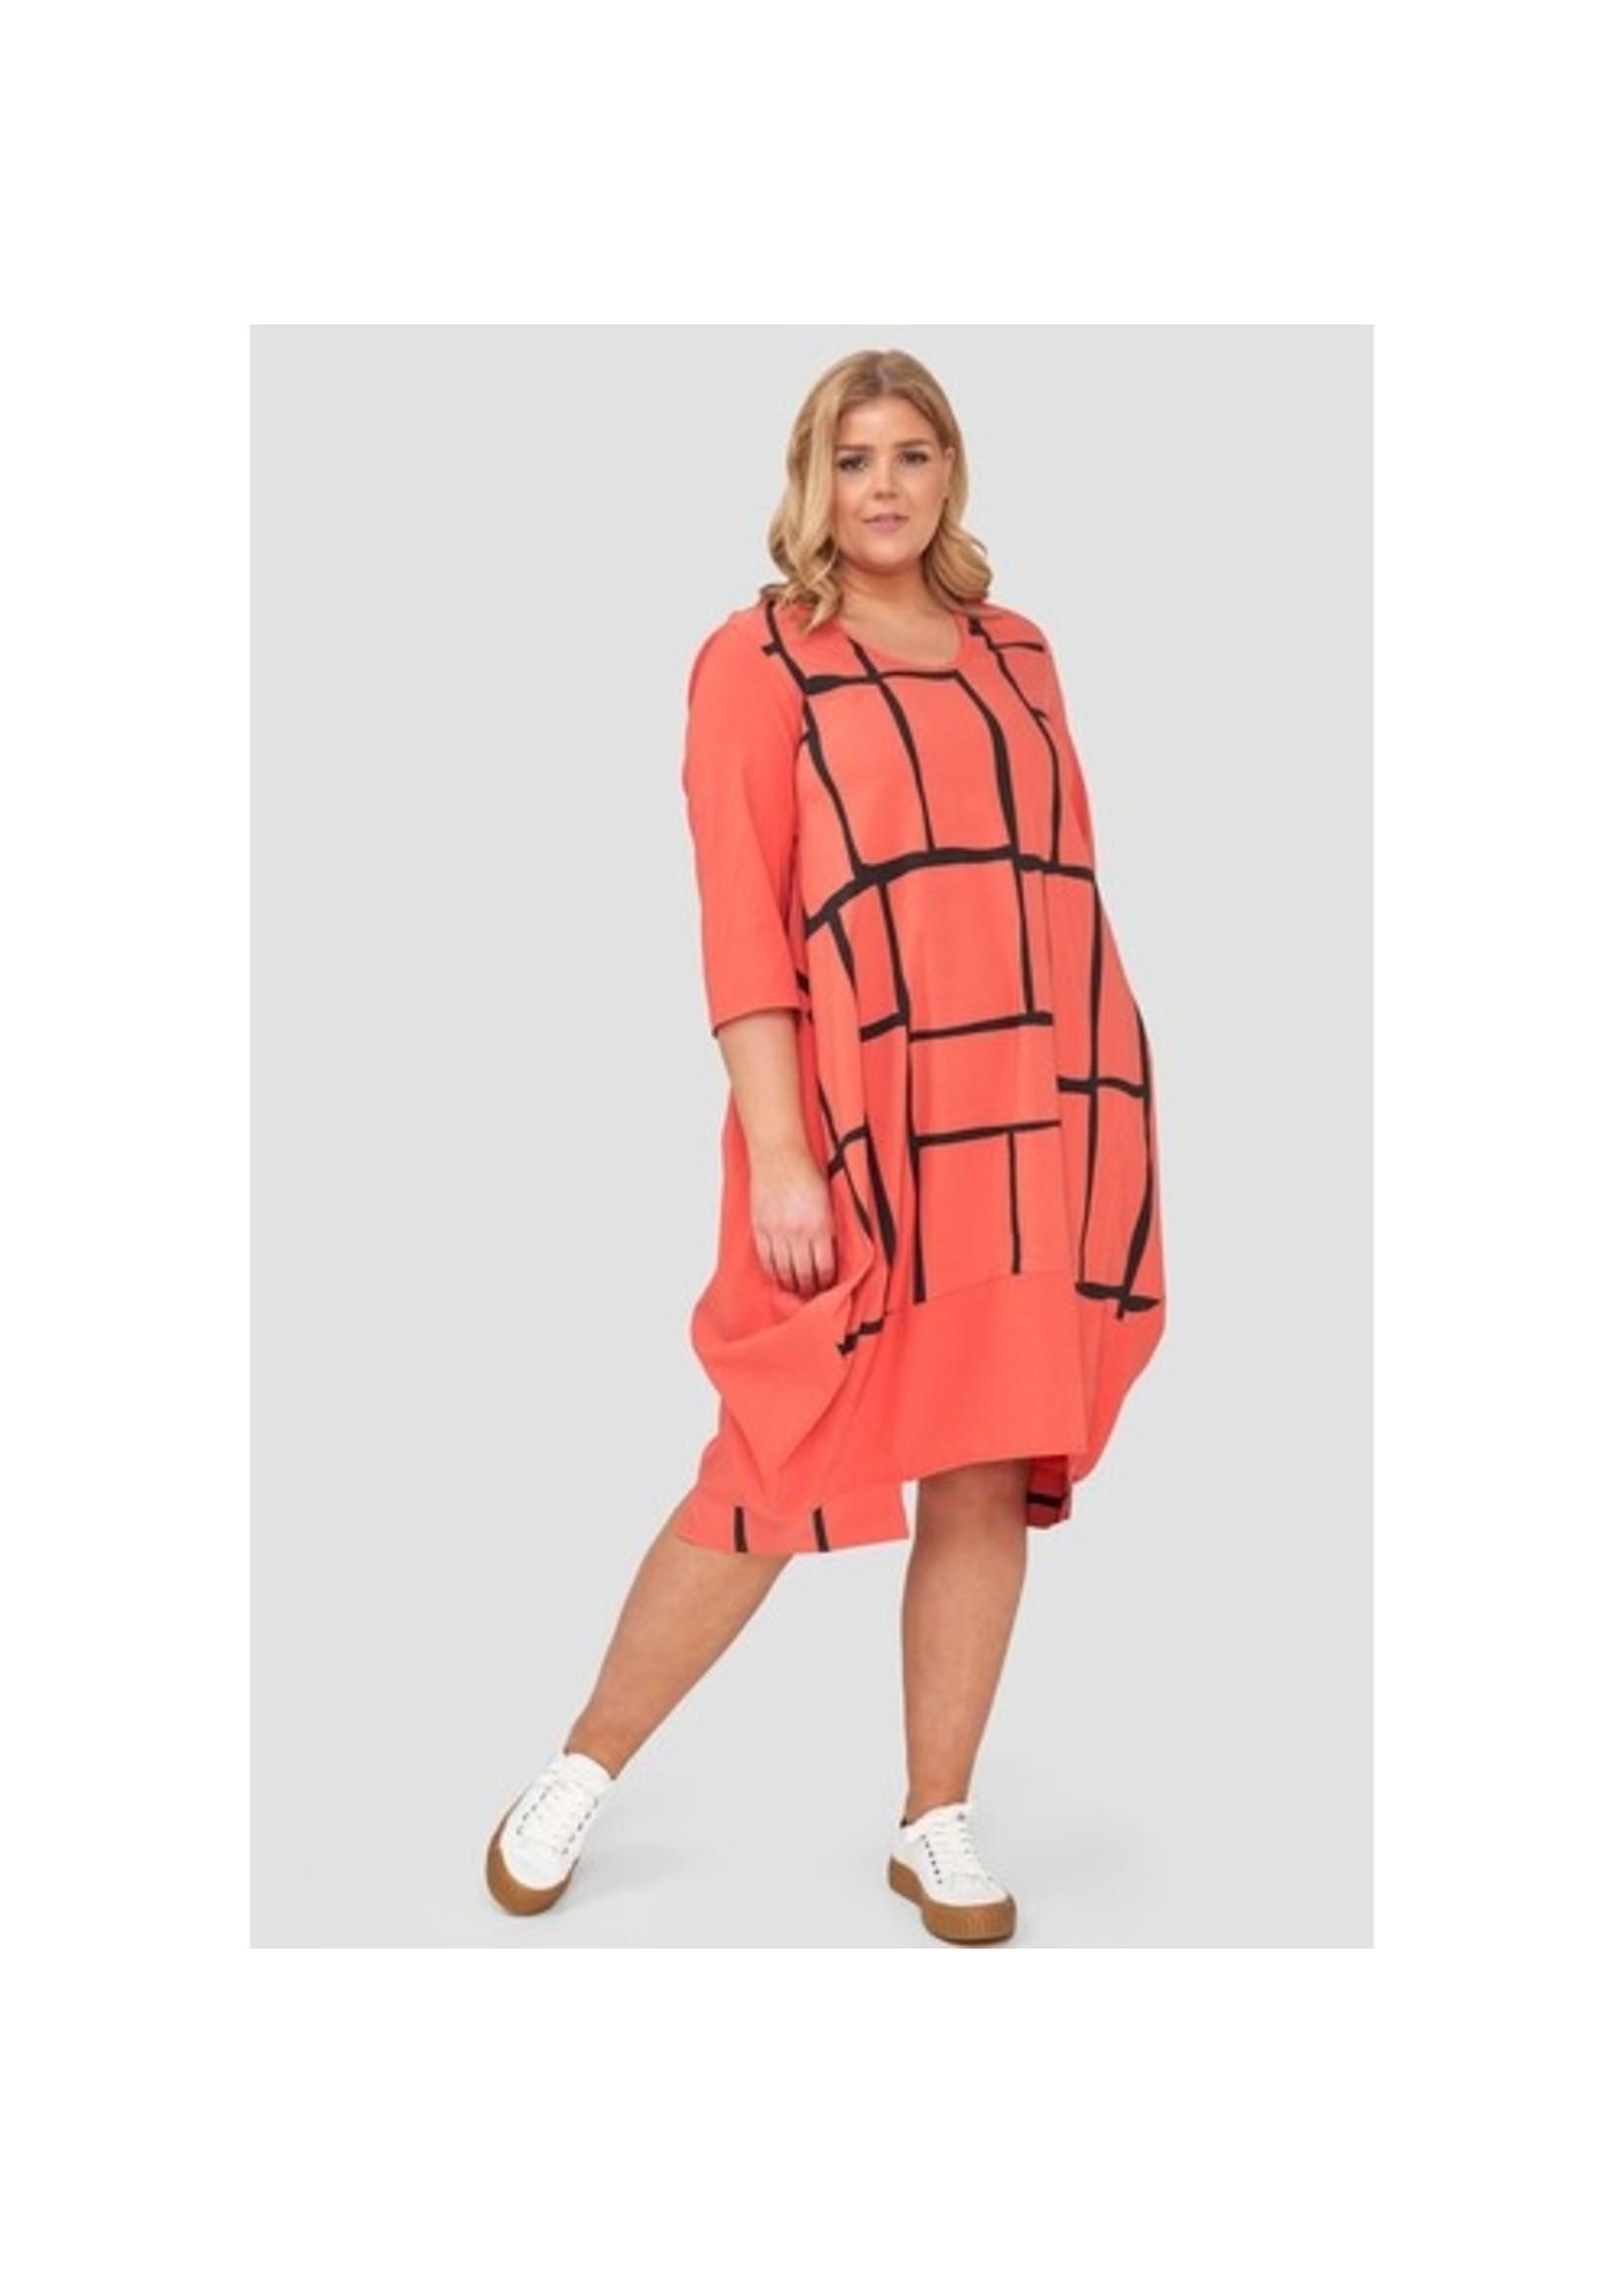 KEKOO 1204231 dress